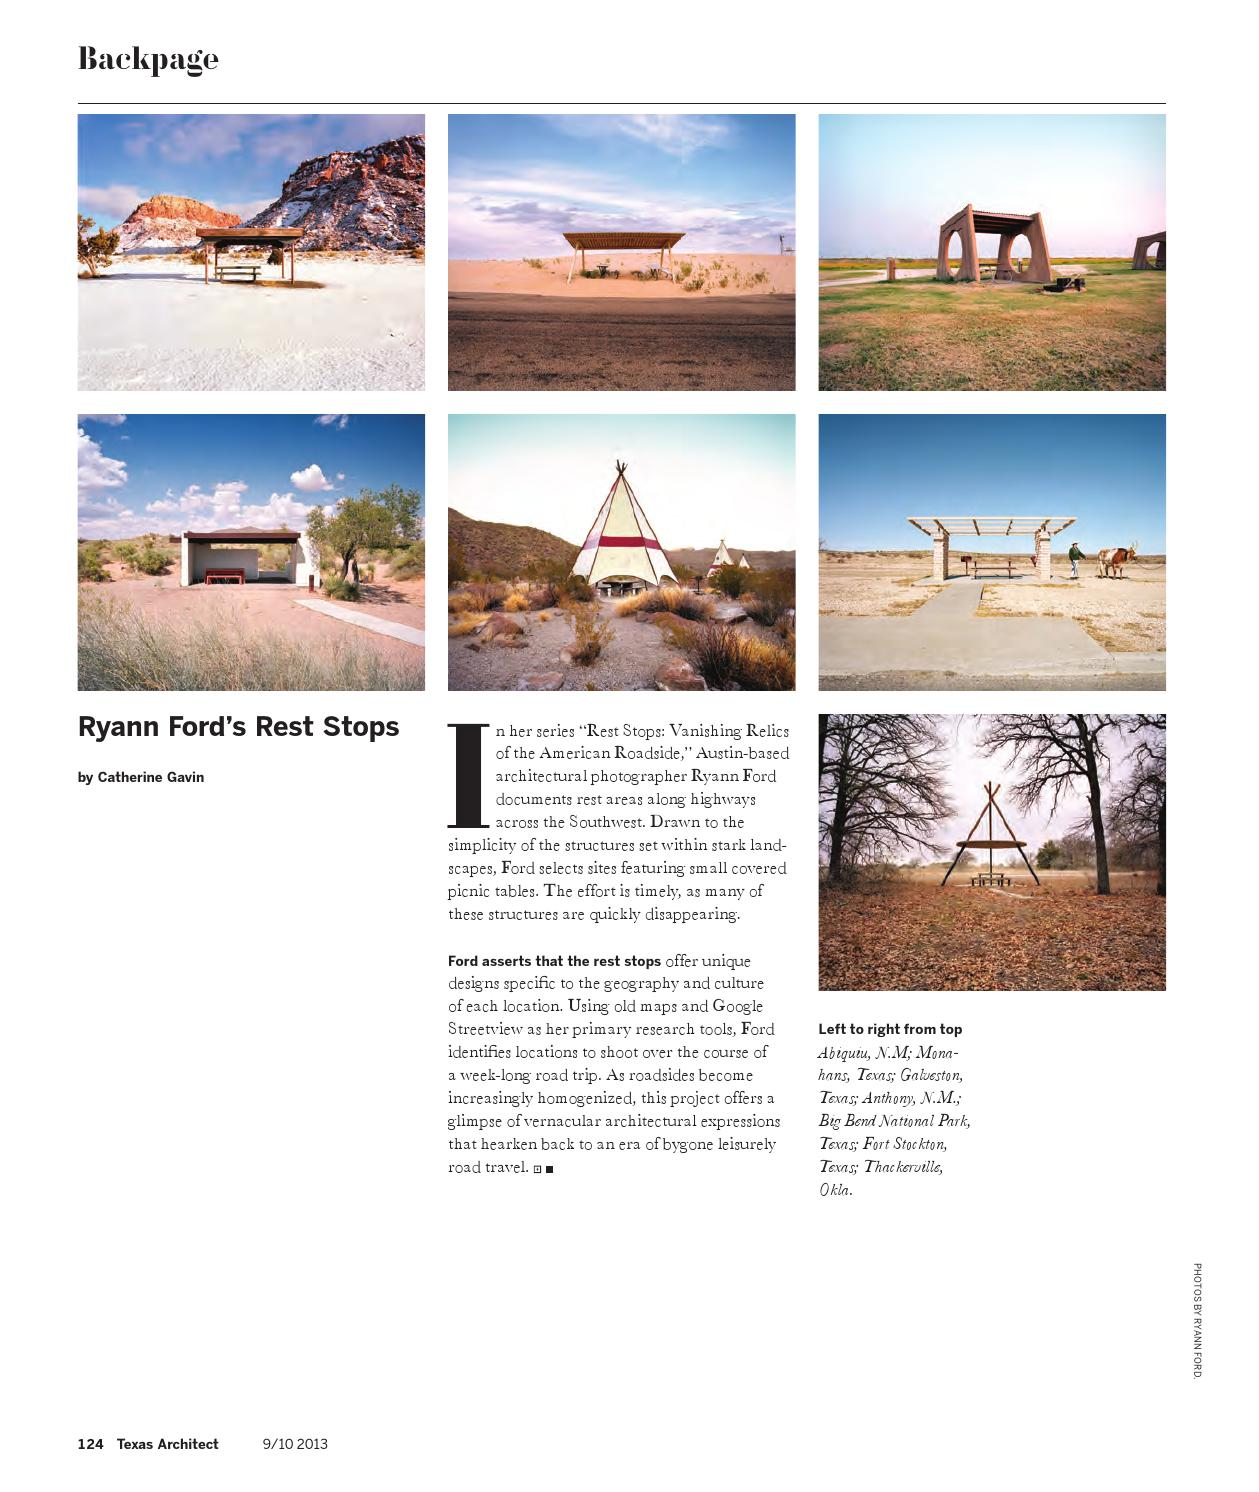 Texas Architect September October 2013 Design Awards By Texas Society Of Architects Issuu